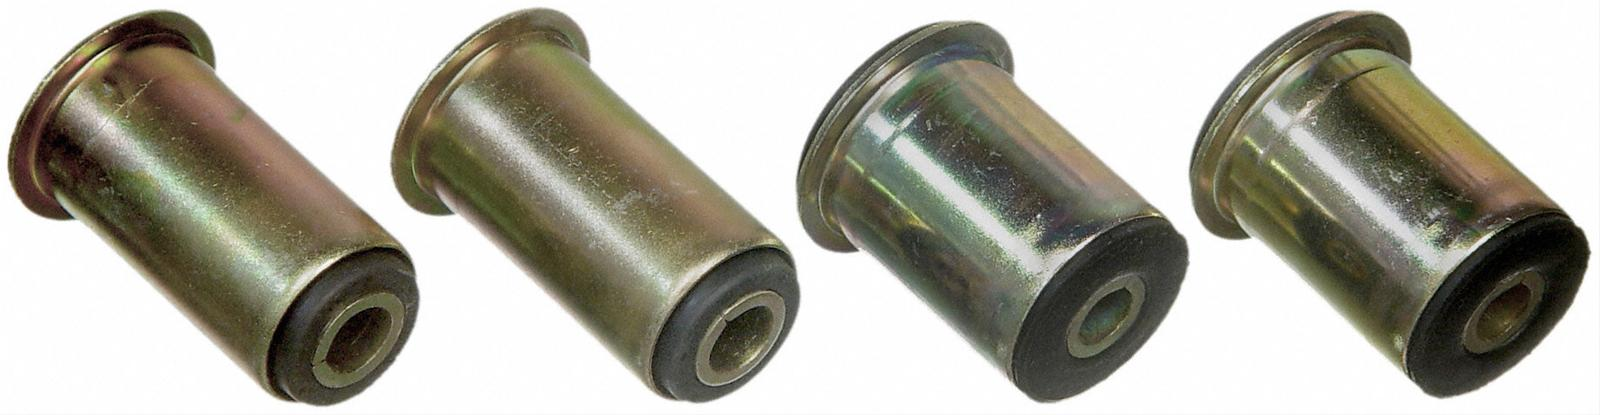 Suspension Control Arm Bushing Kit Front Lower Moog K7194